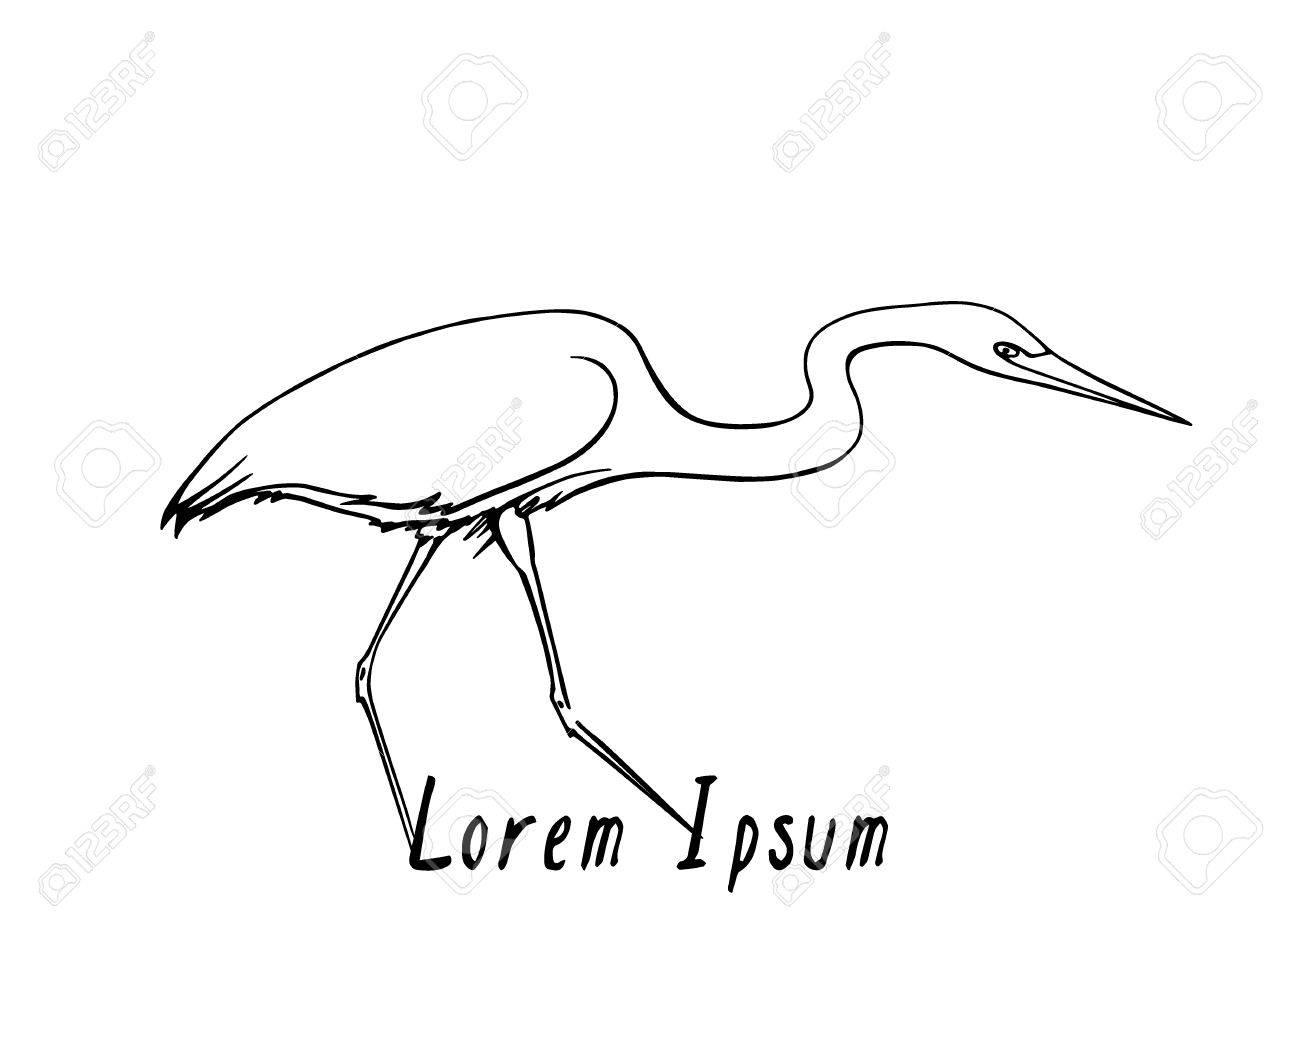 1300x1040 Vector Illustration Of Hand Drawn Walking Heron. Beautiful Ink